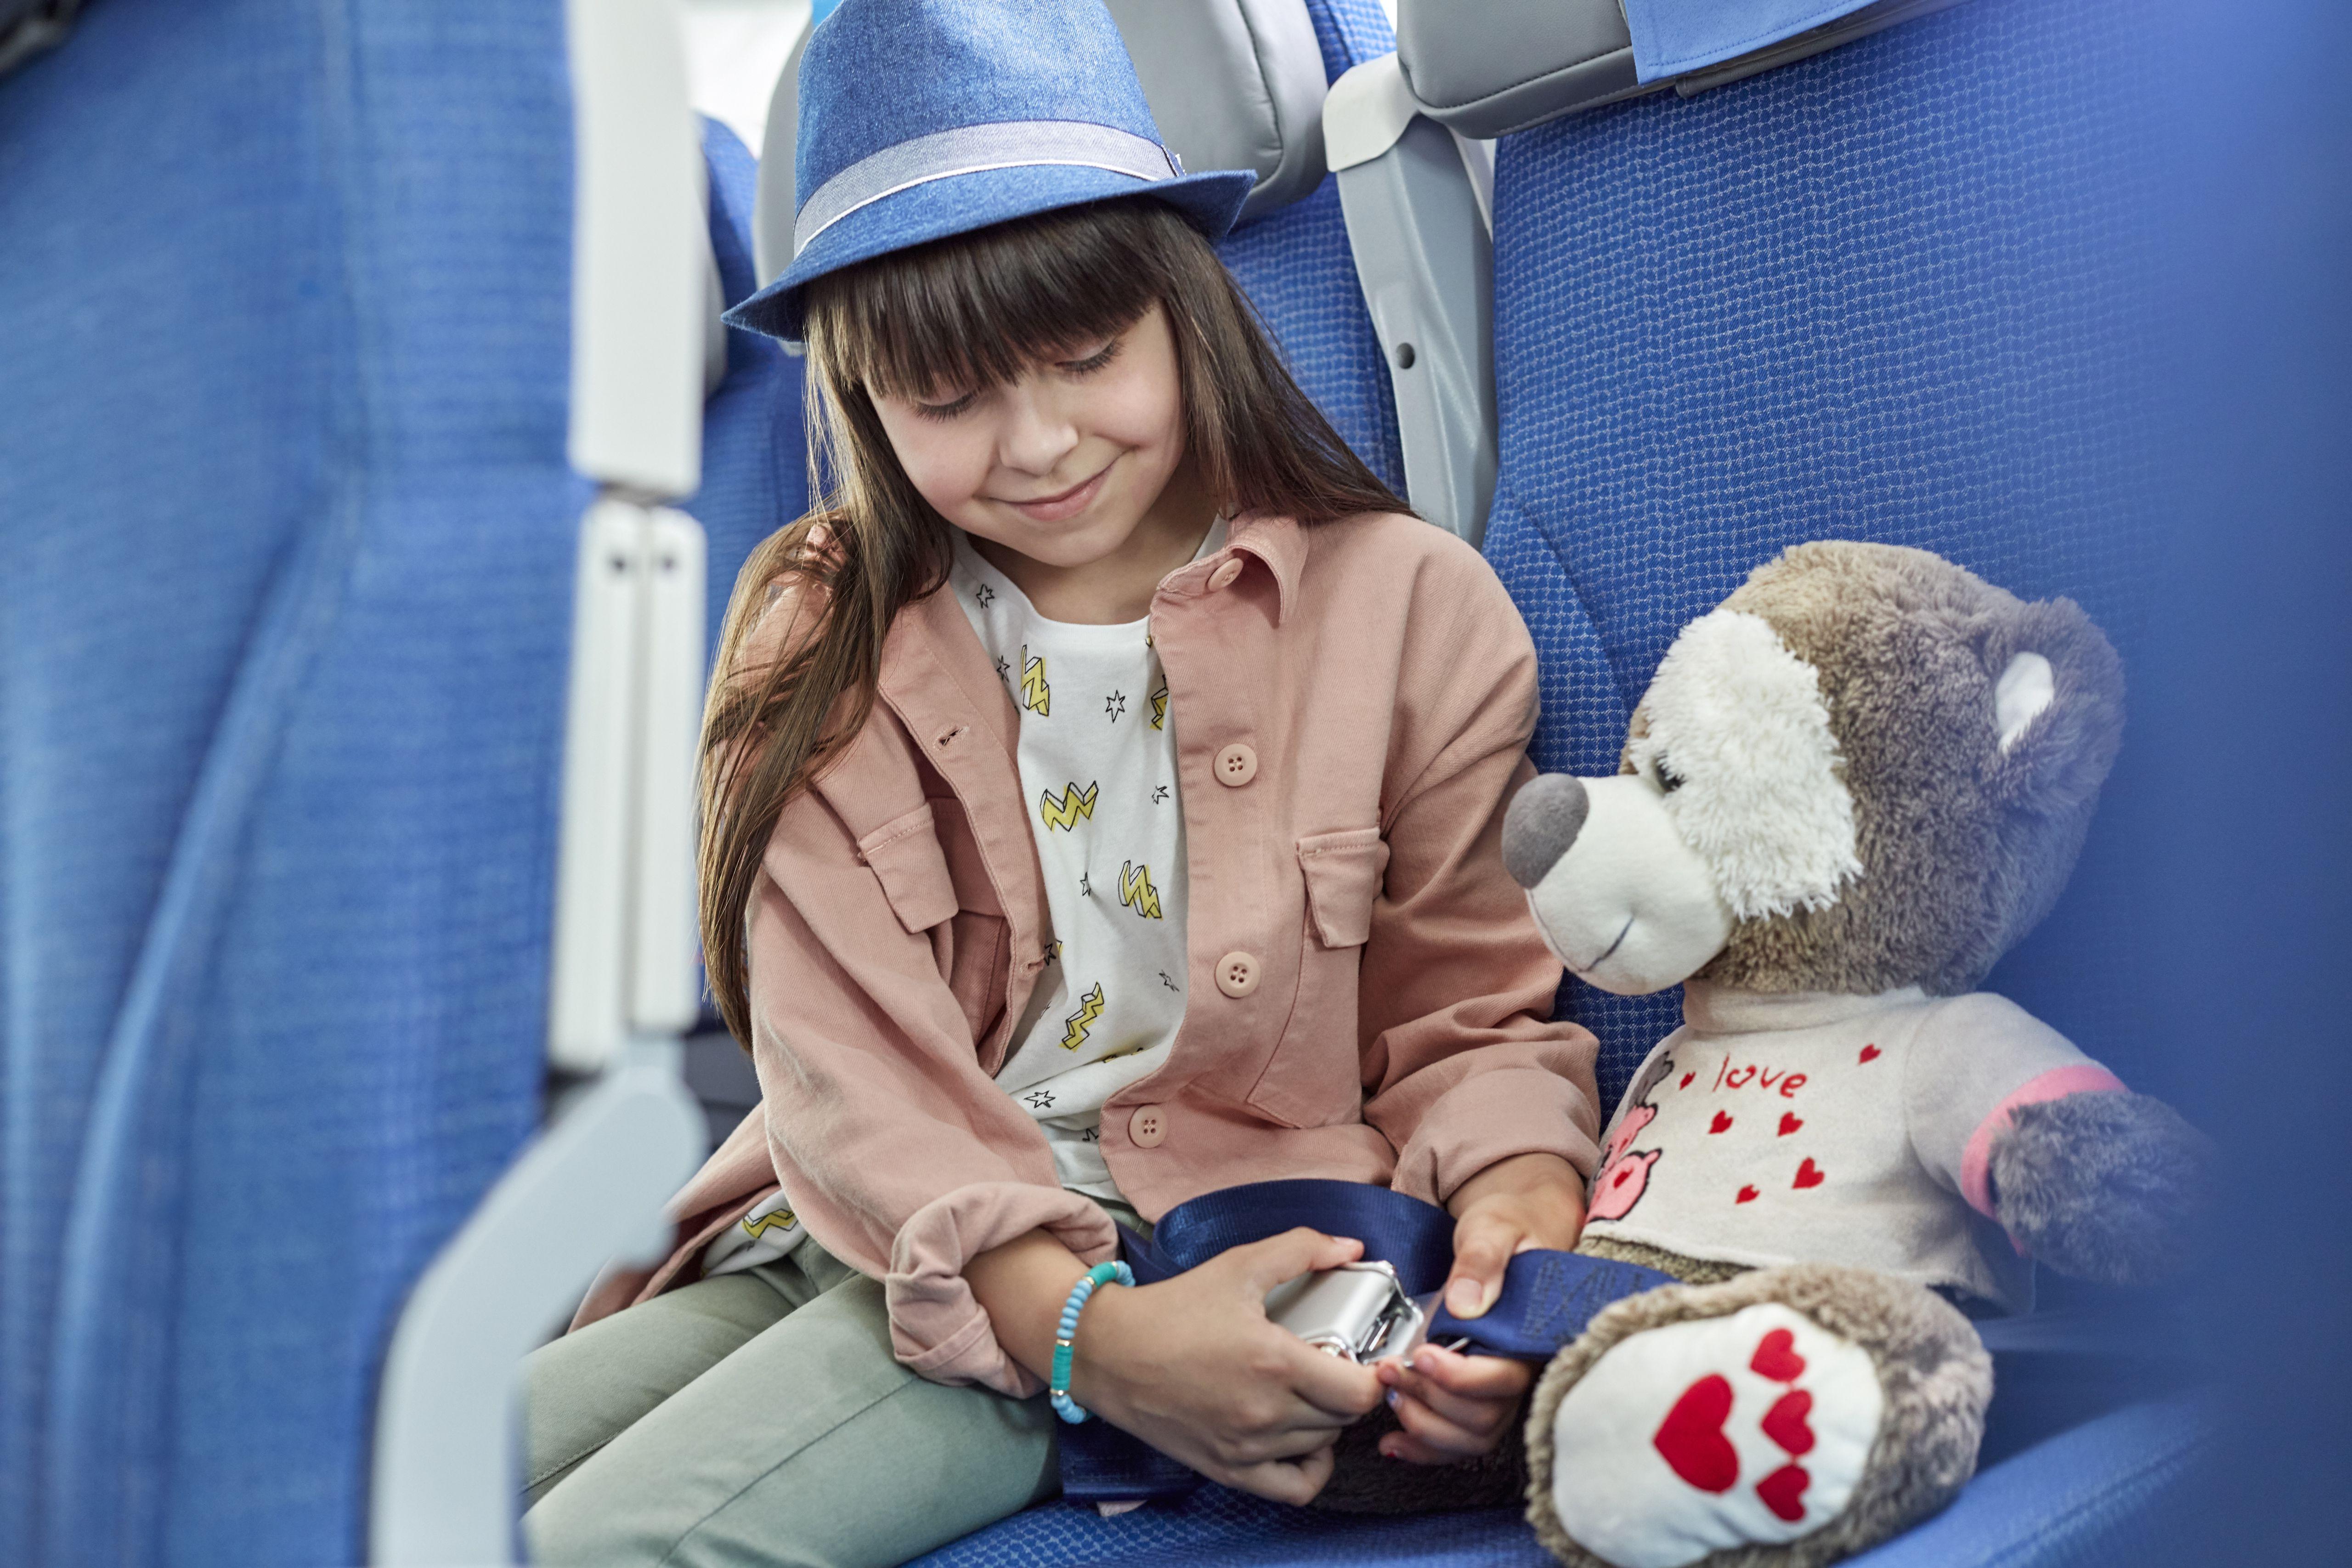 Girl fastening seat belt on stuffed animal on airplane